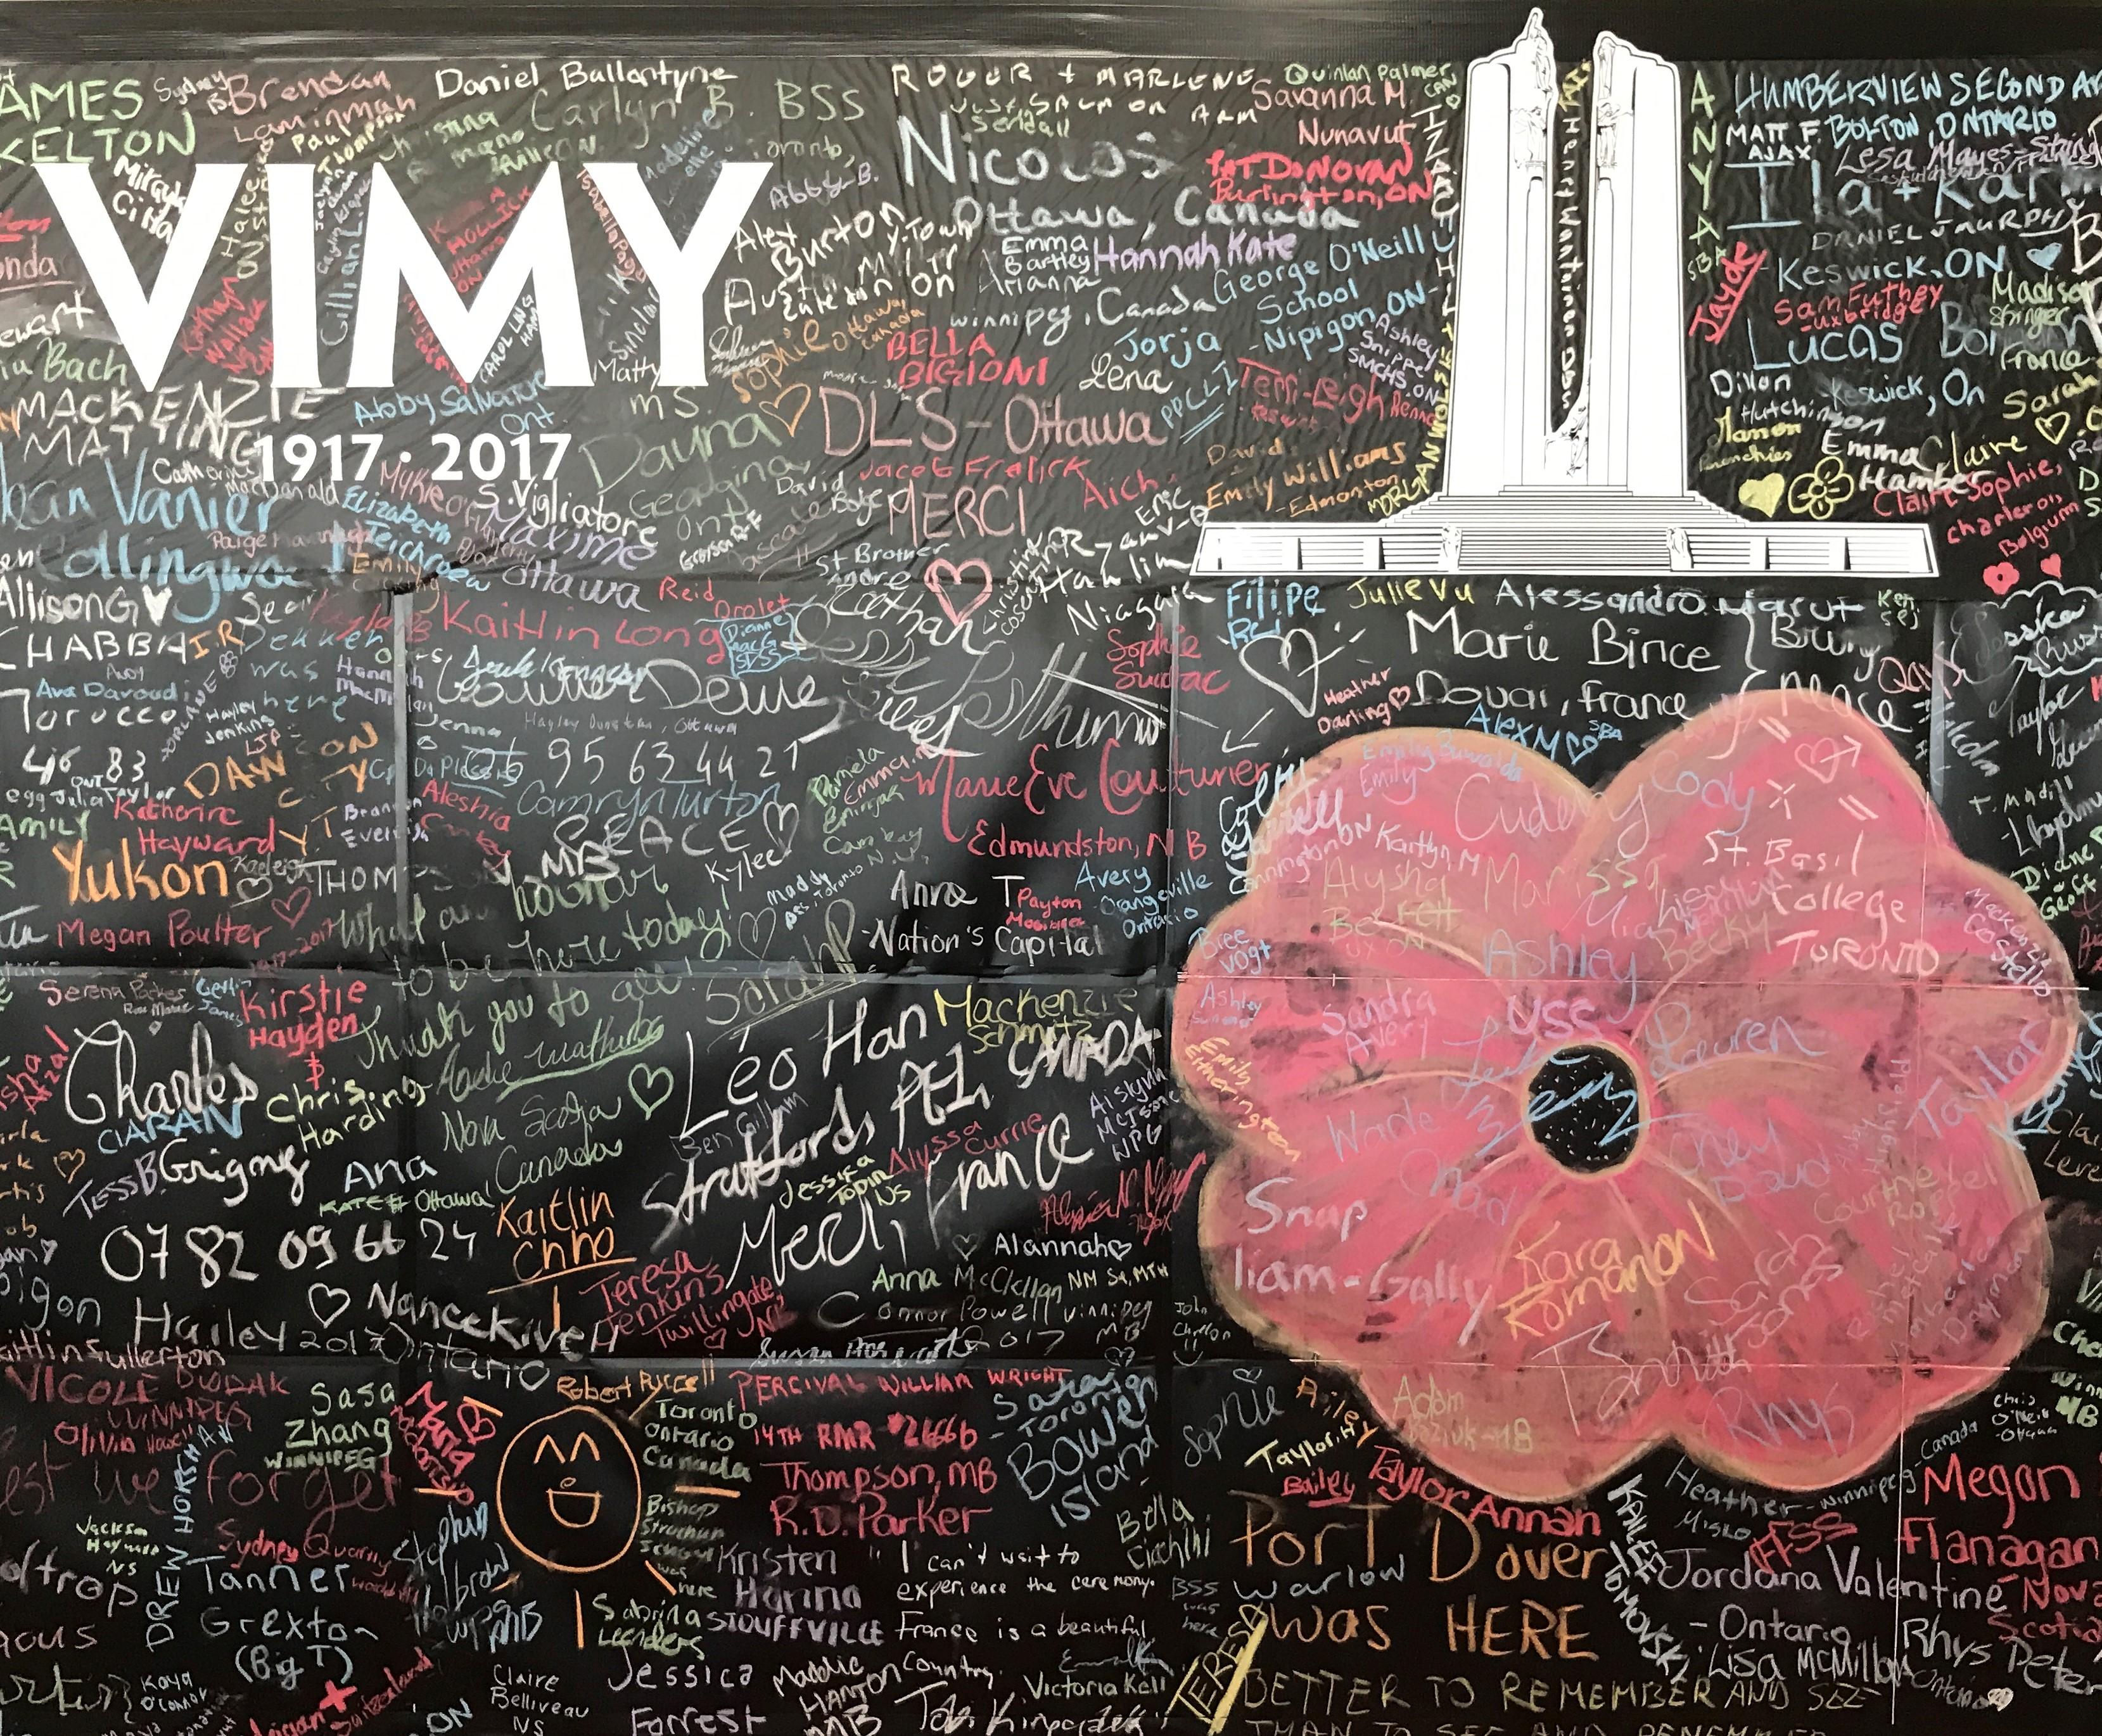 Commemorating Vimy on the Ridge by Katrina Pasierbek